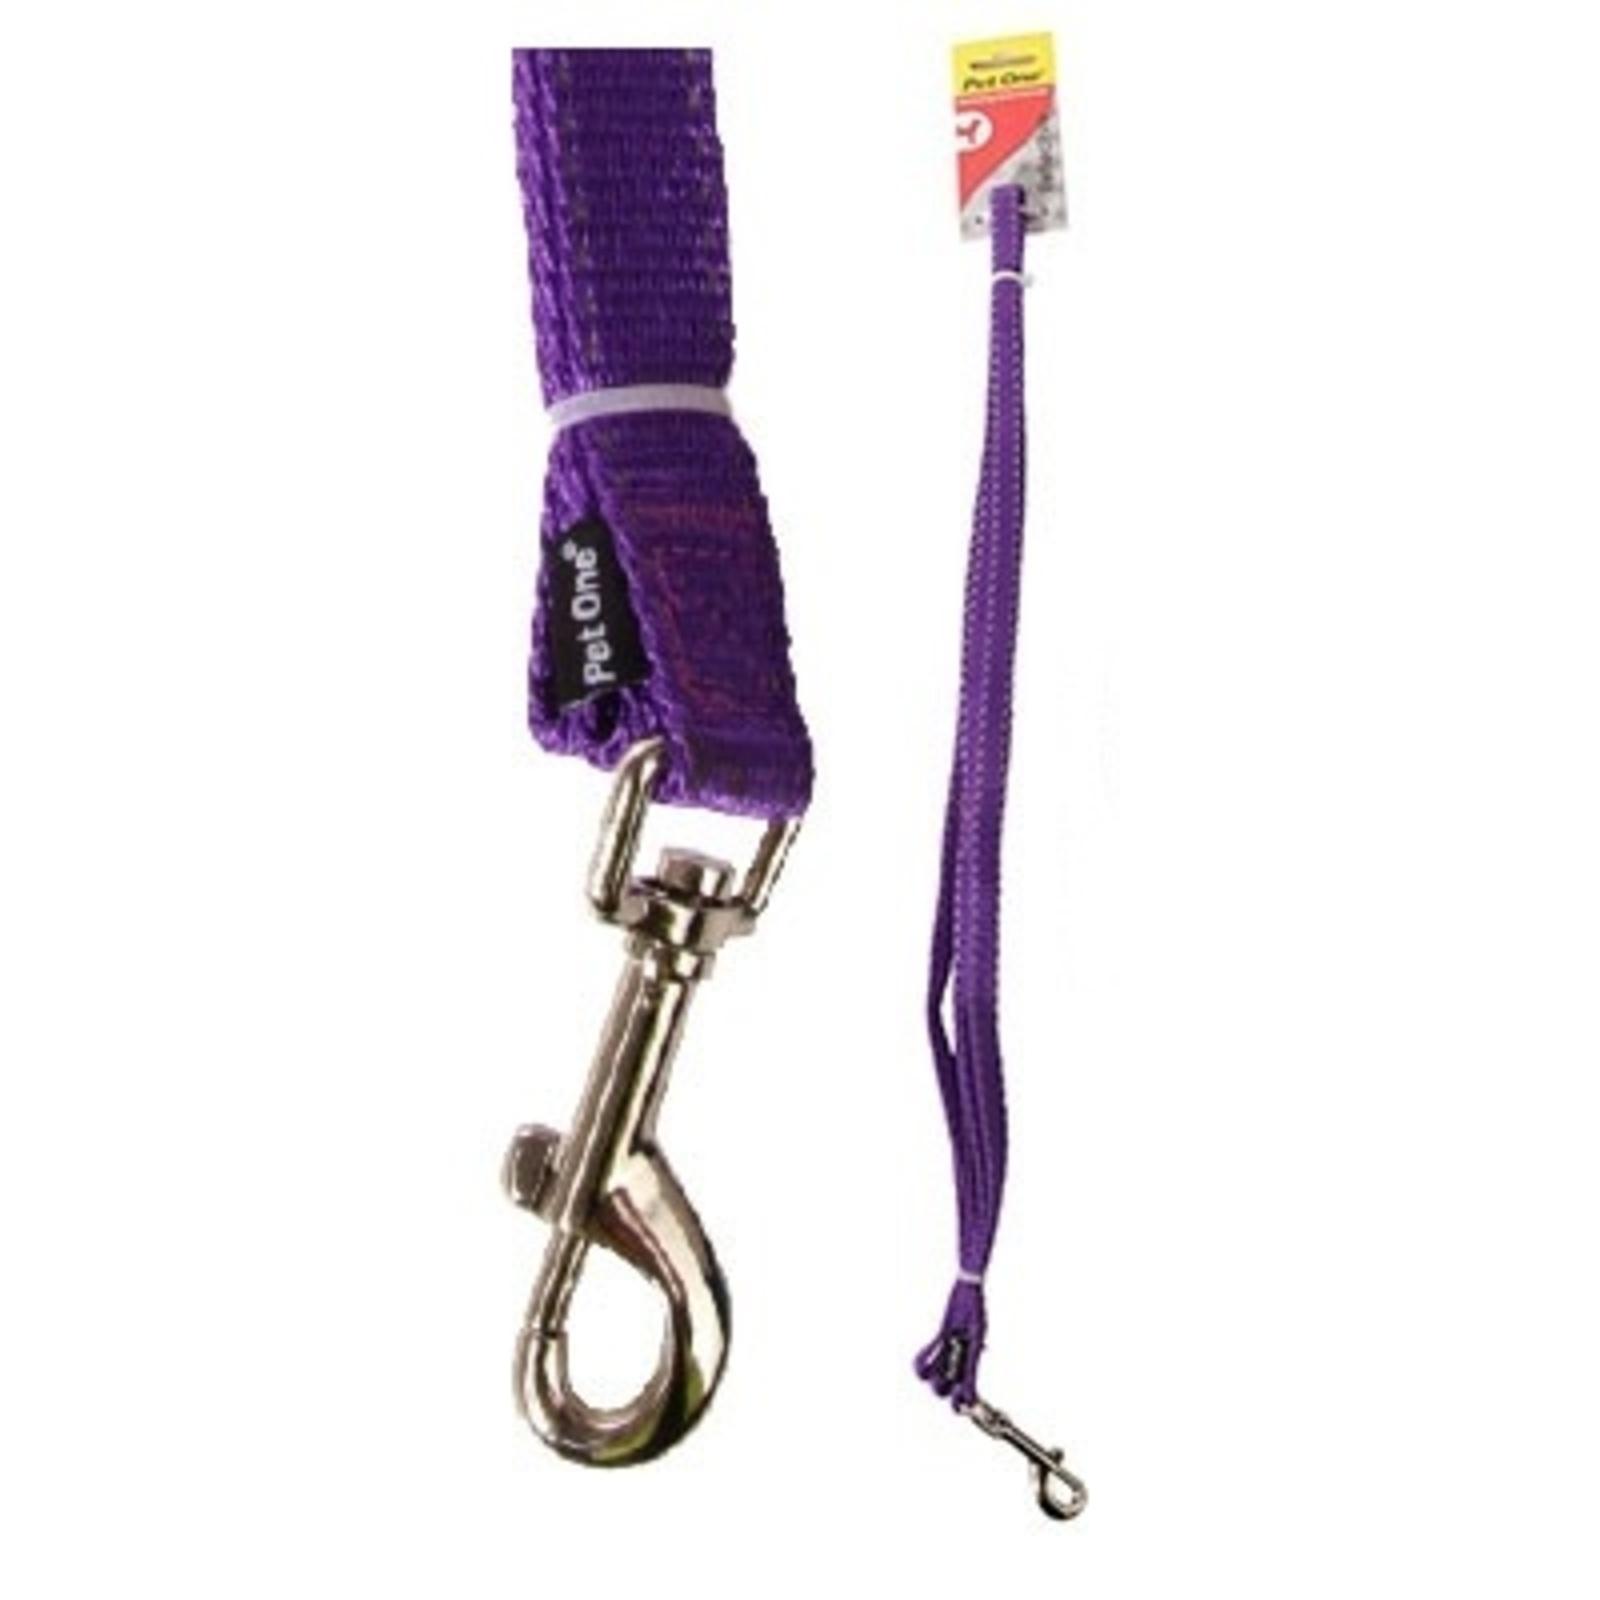 Dog Leash Lead Reflective Nylon - Purple - 15mm x 150cm (Pet One)